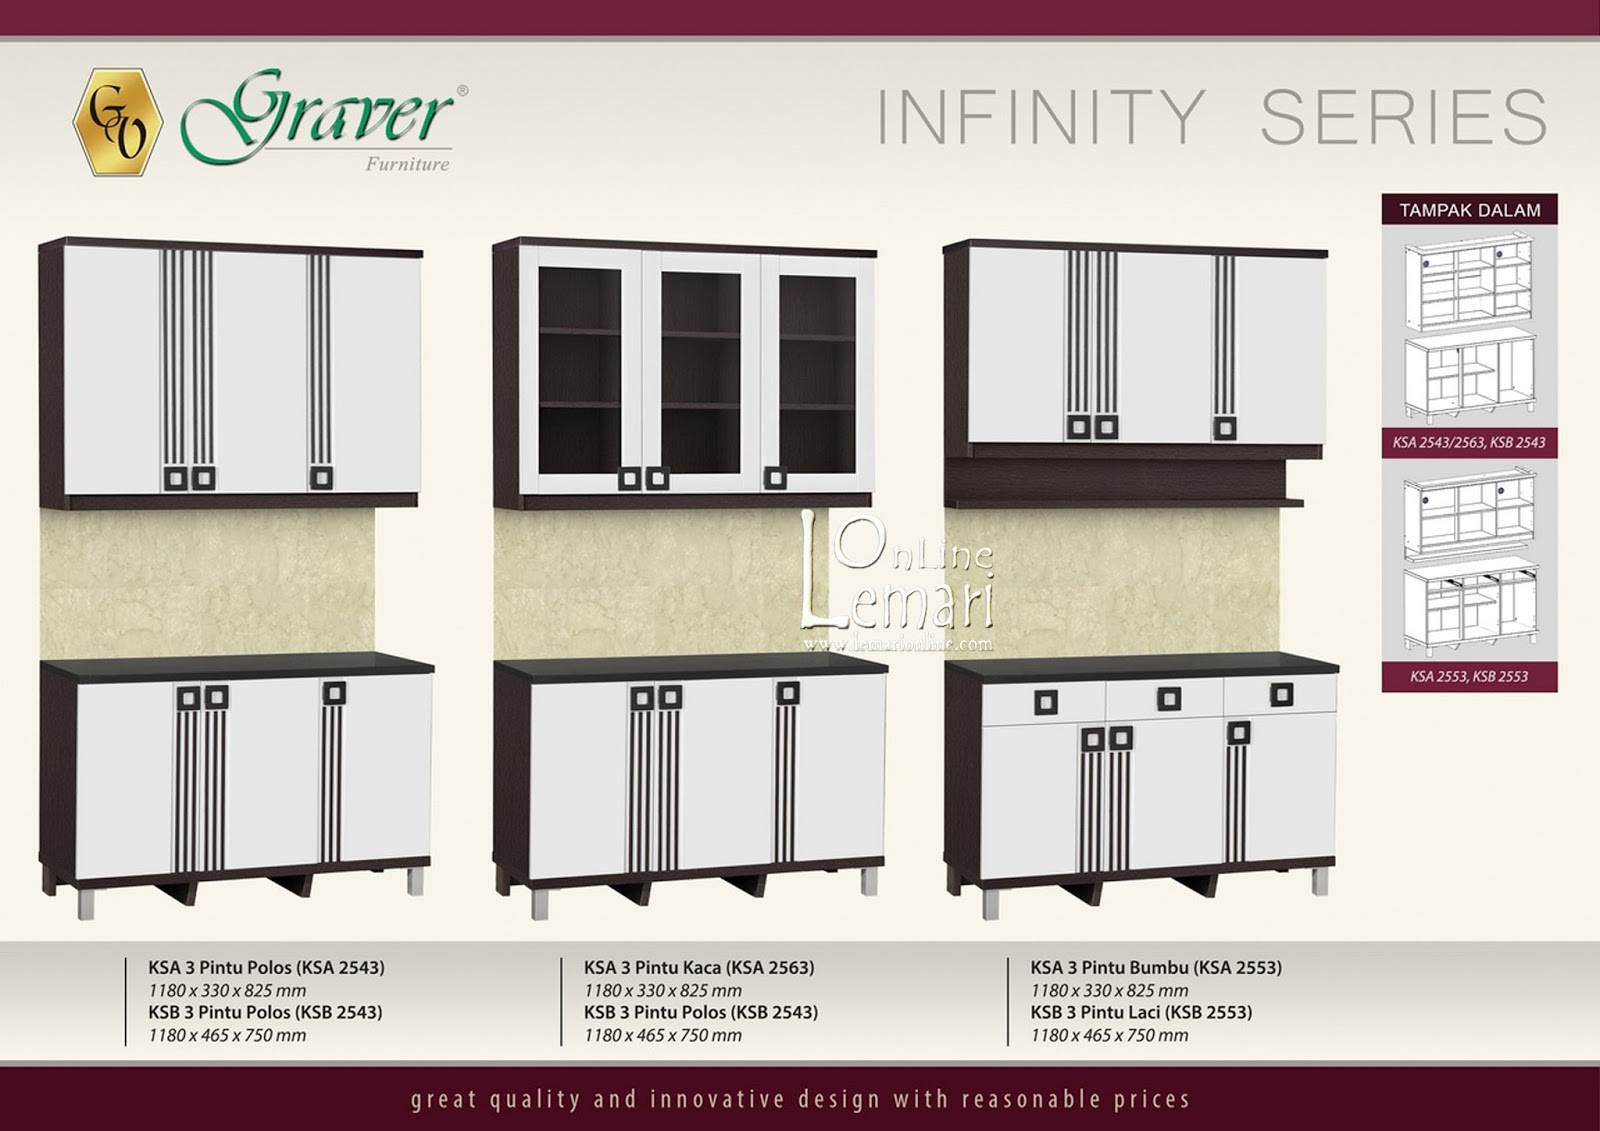 Graver Furniture Kitchen Set Bawah 3 Pintu Ksb 2653 Update Daftar